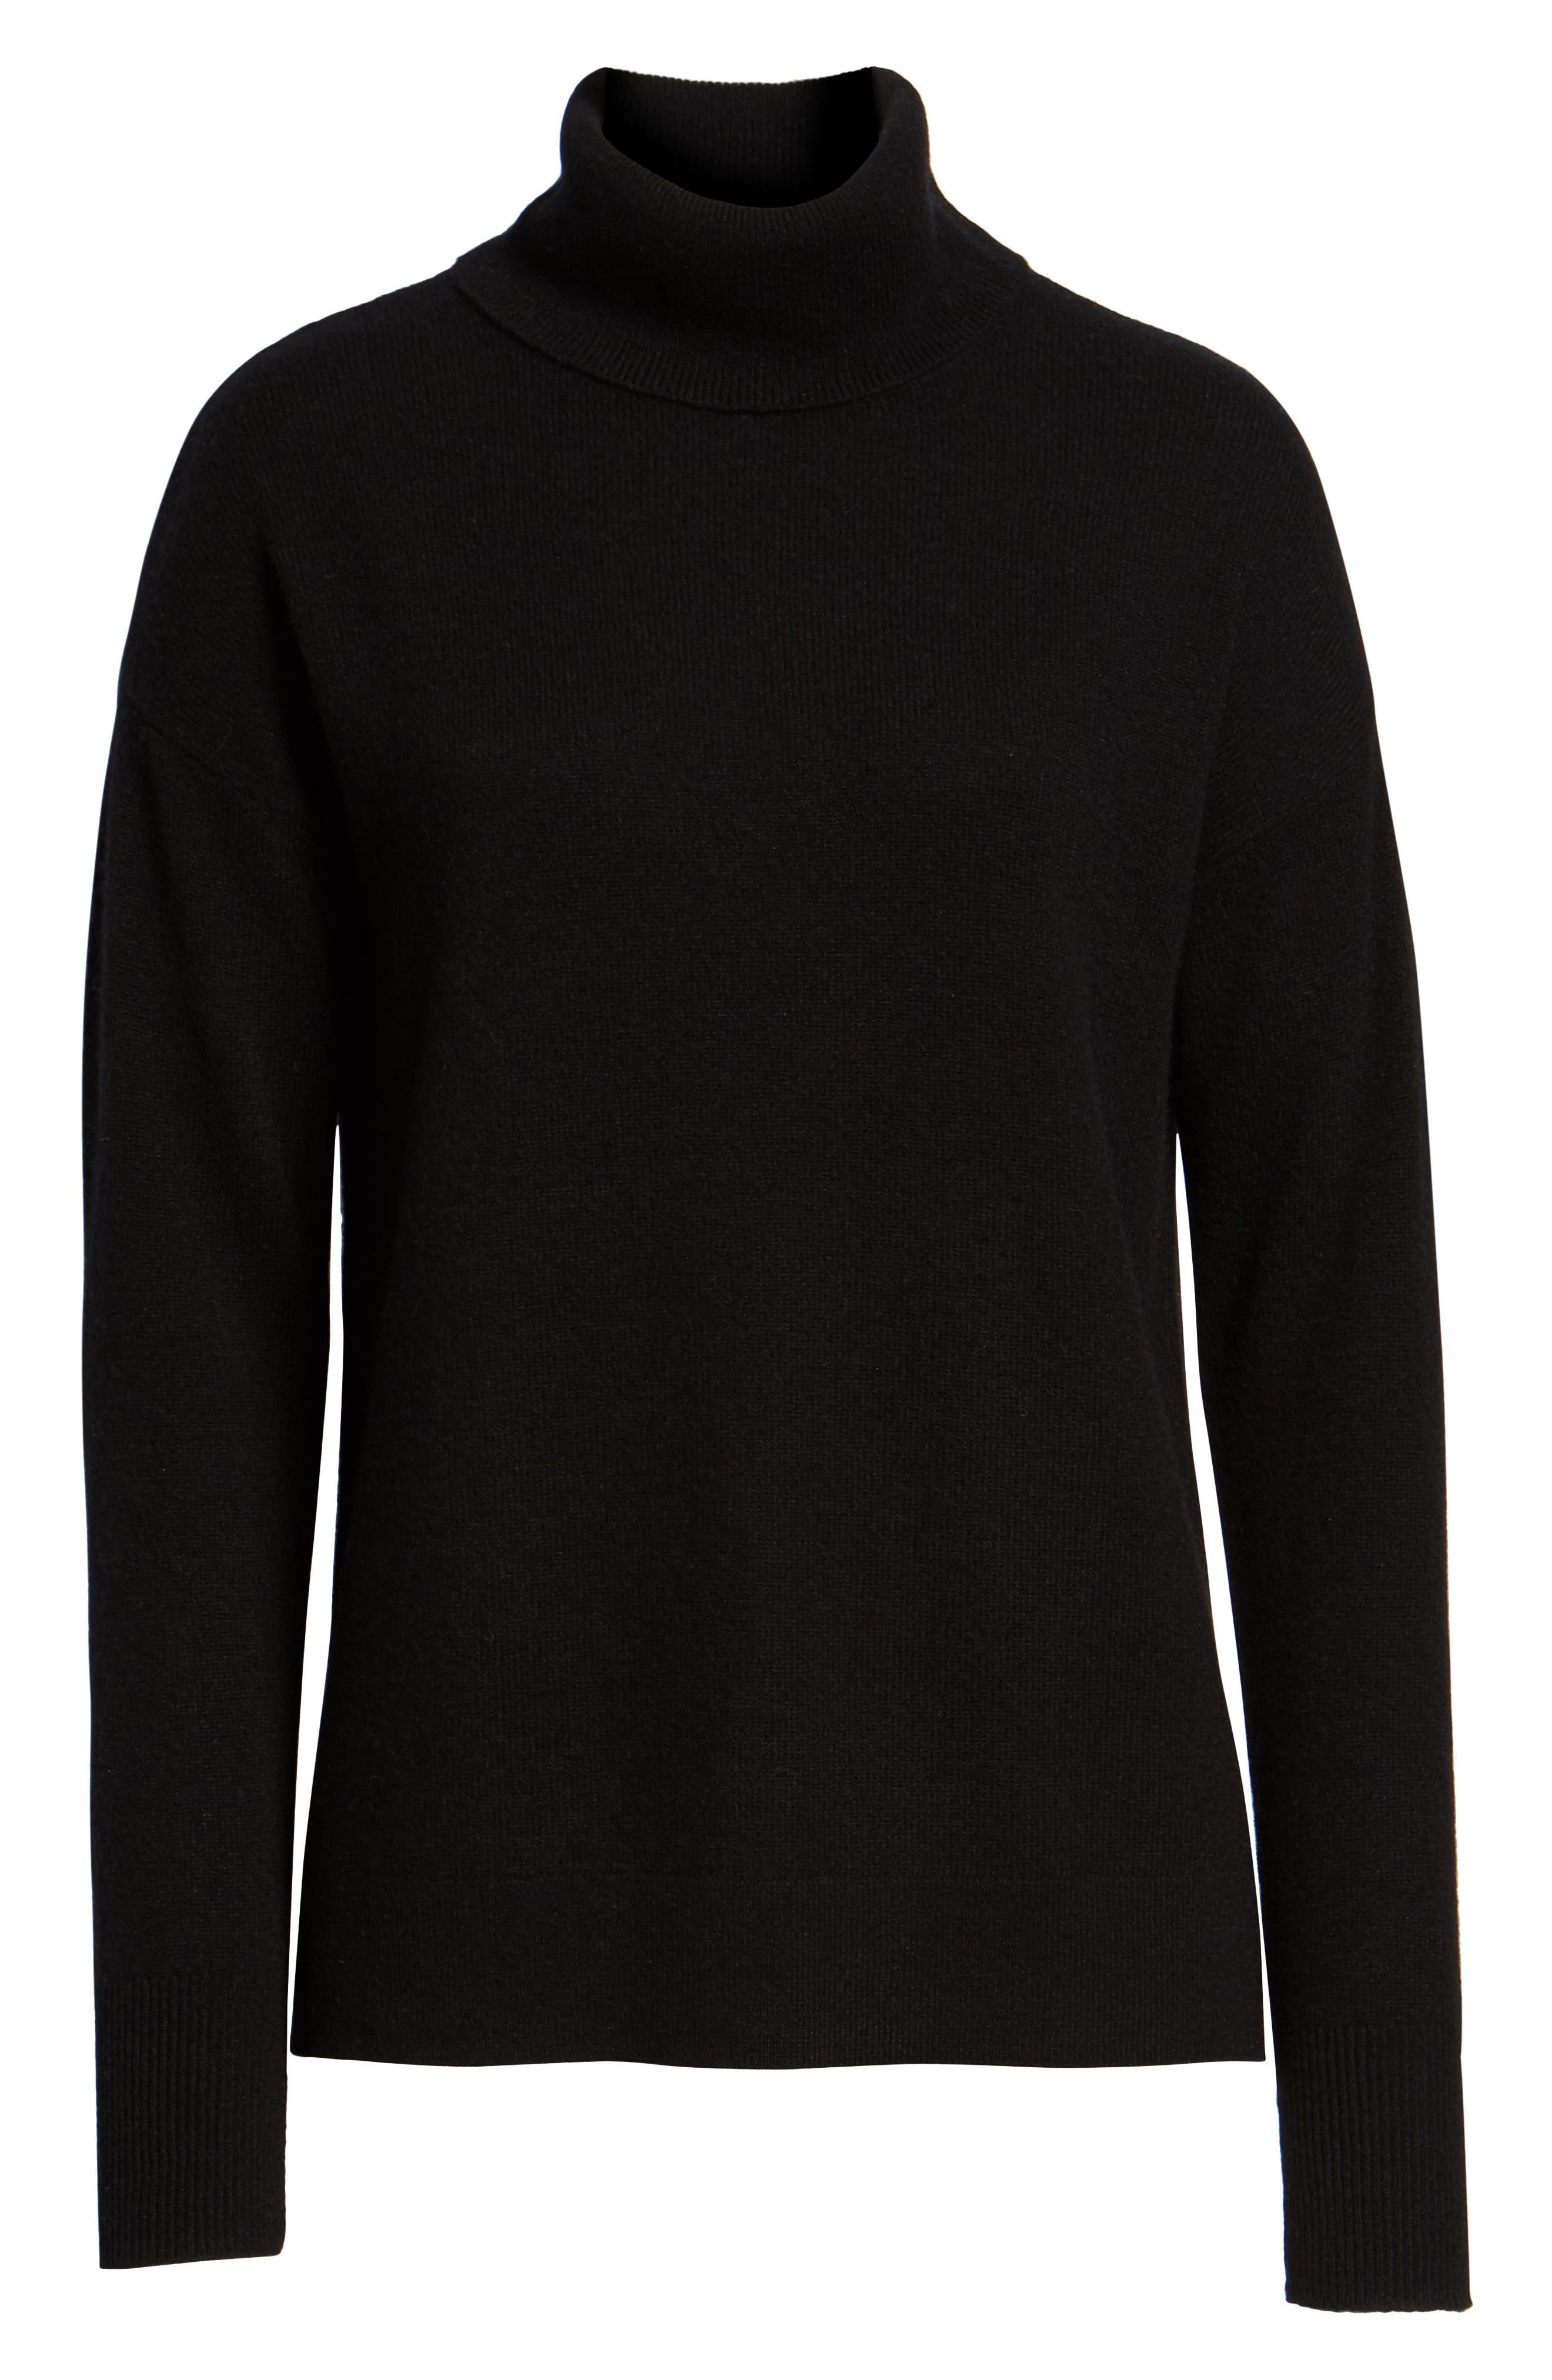 HALOGEN<SUP>®</SUP>, Cashmere Turtleneck Sweater, Alternate thumbnail 6, color, 001